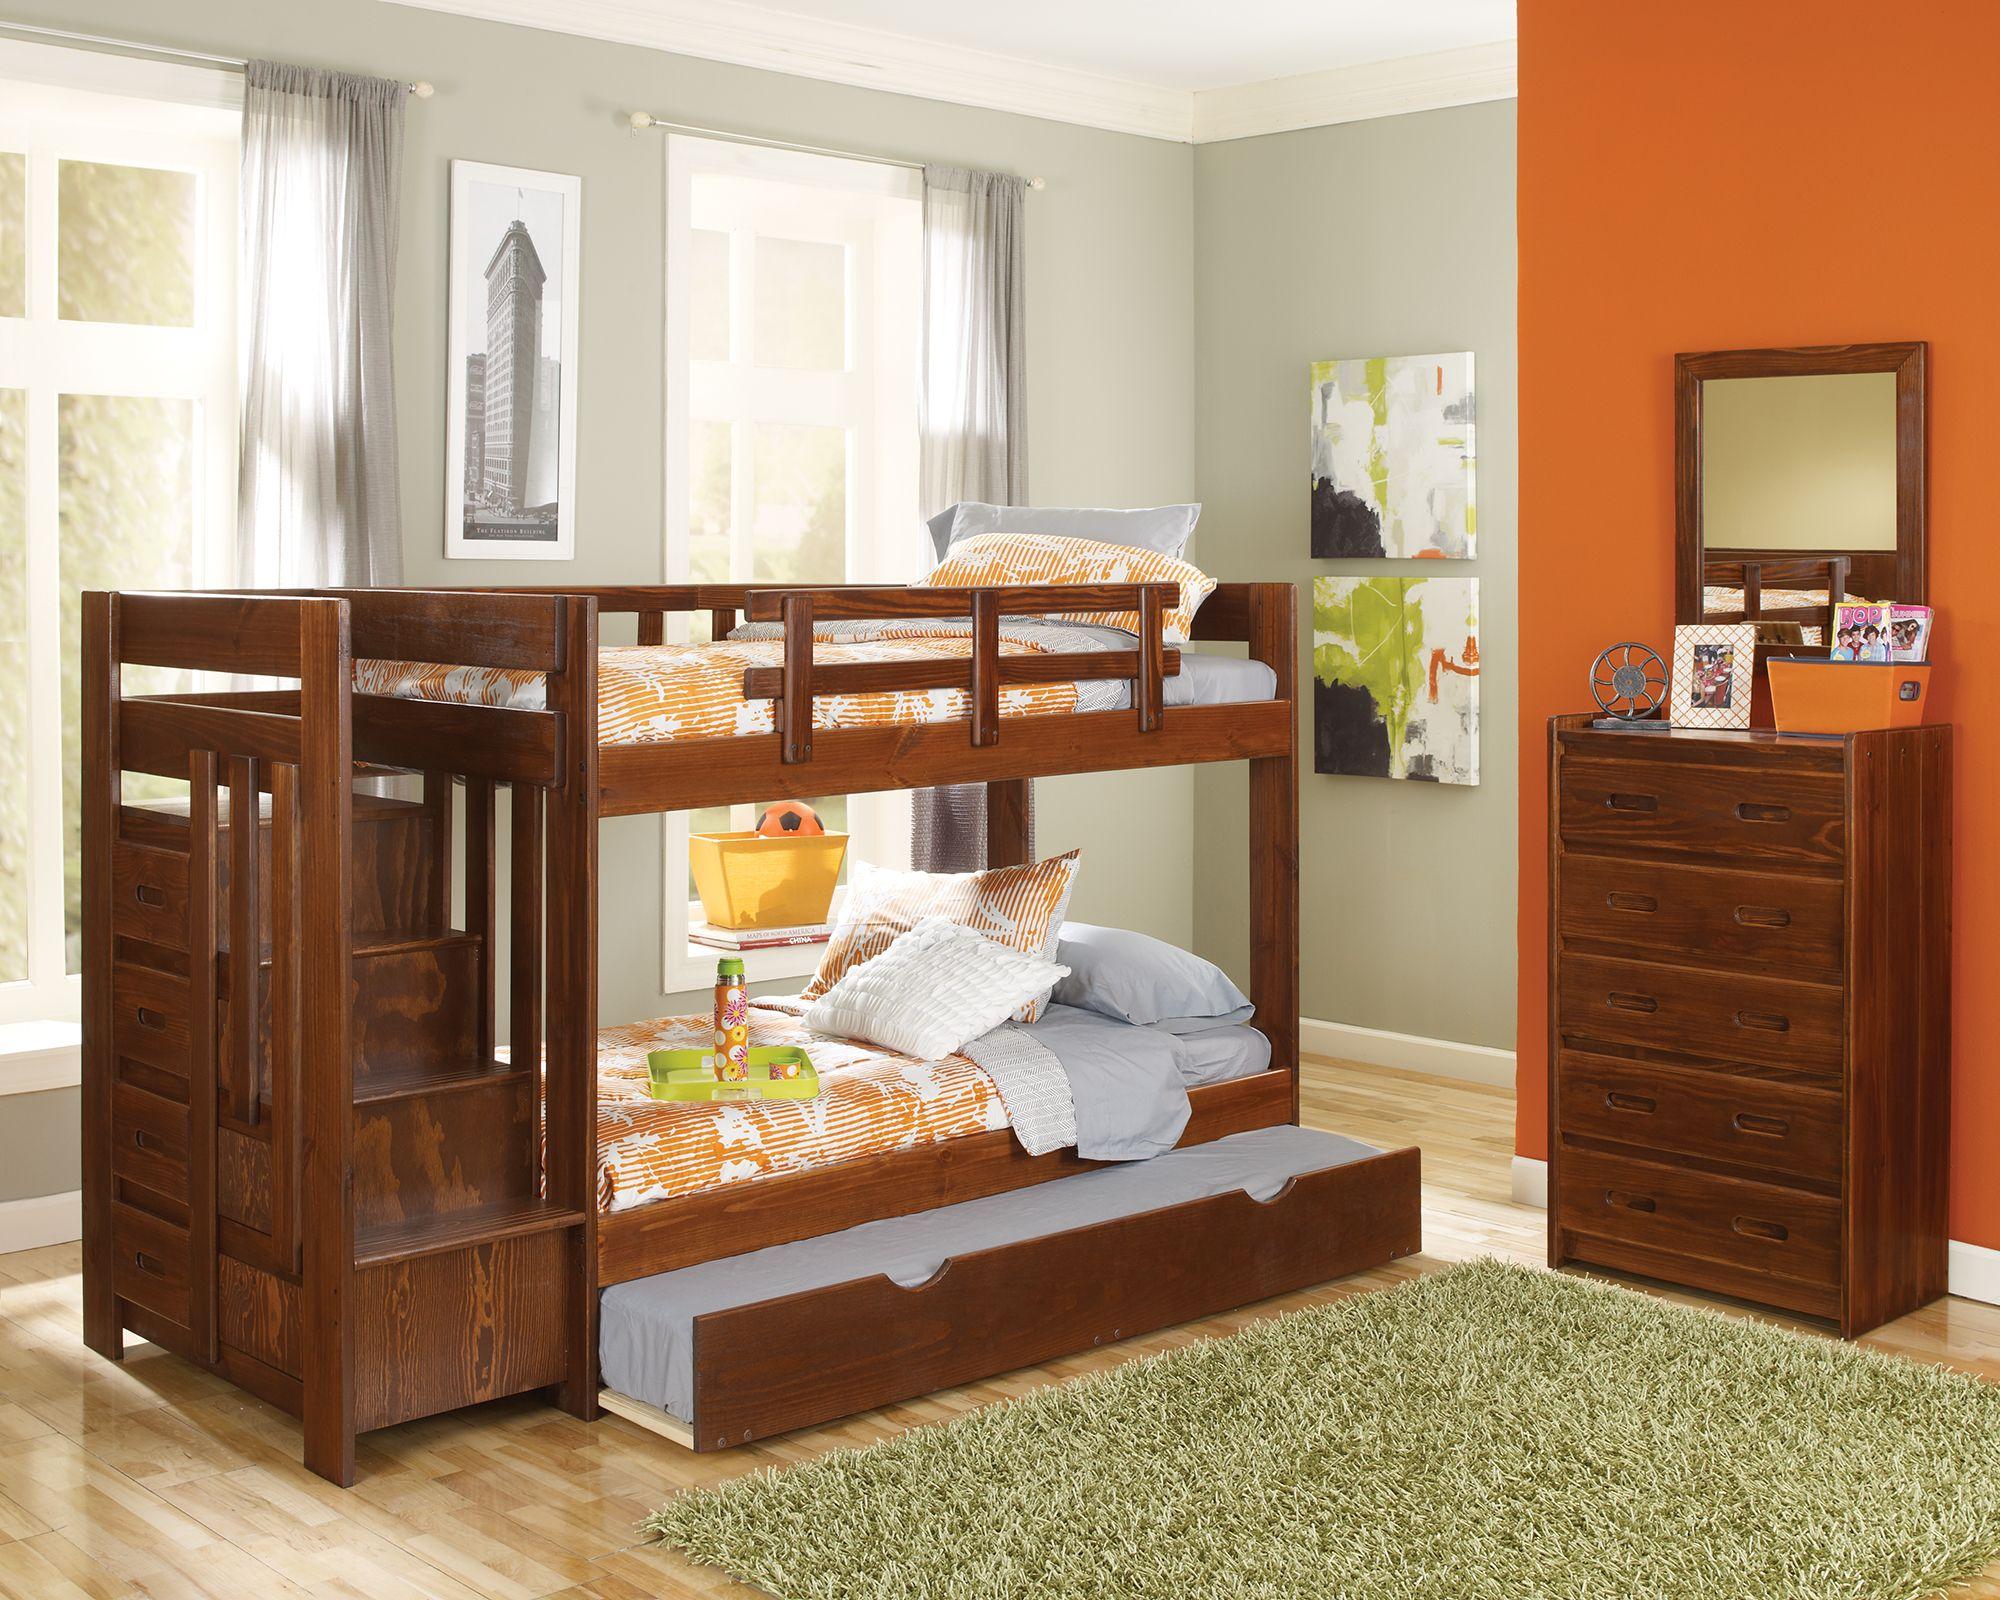 Xsth154 Woodcrest Stair Step Bunk Bed Daniesl Bunk Beds Bunk